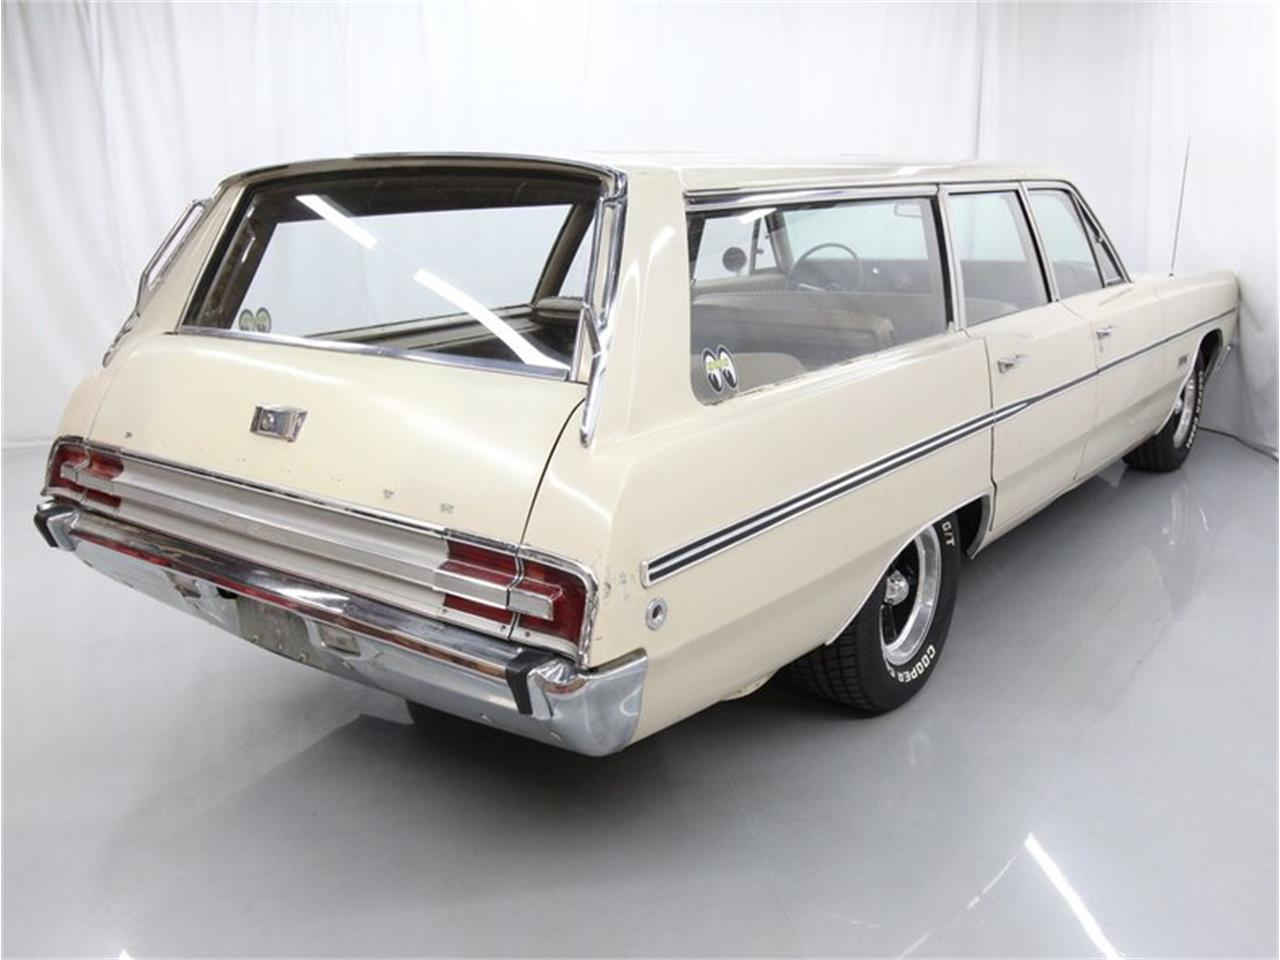 1968 Plymouth Suburban (CC-1378515) for sale in Christiansburg, Virginia